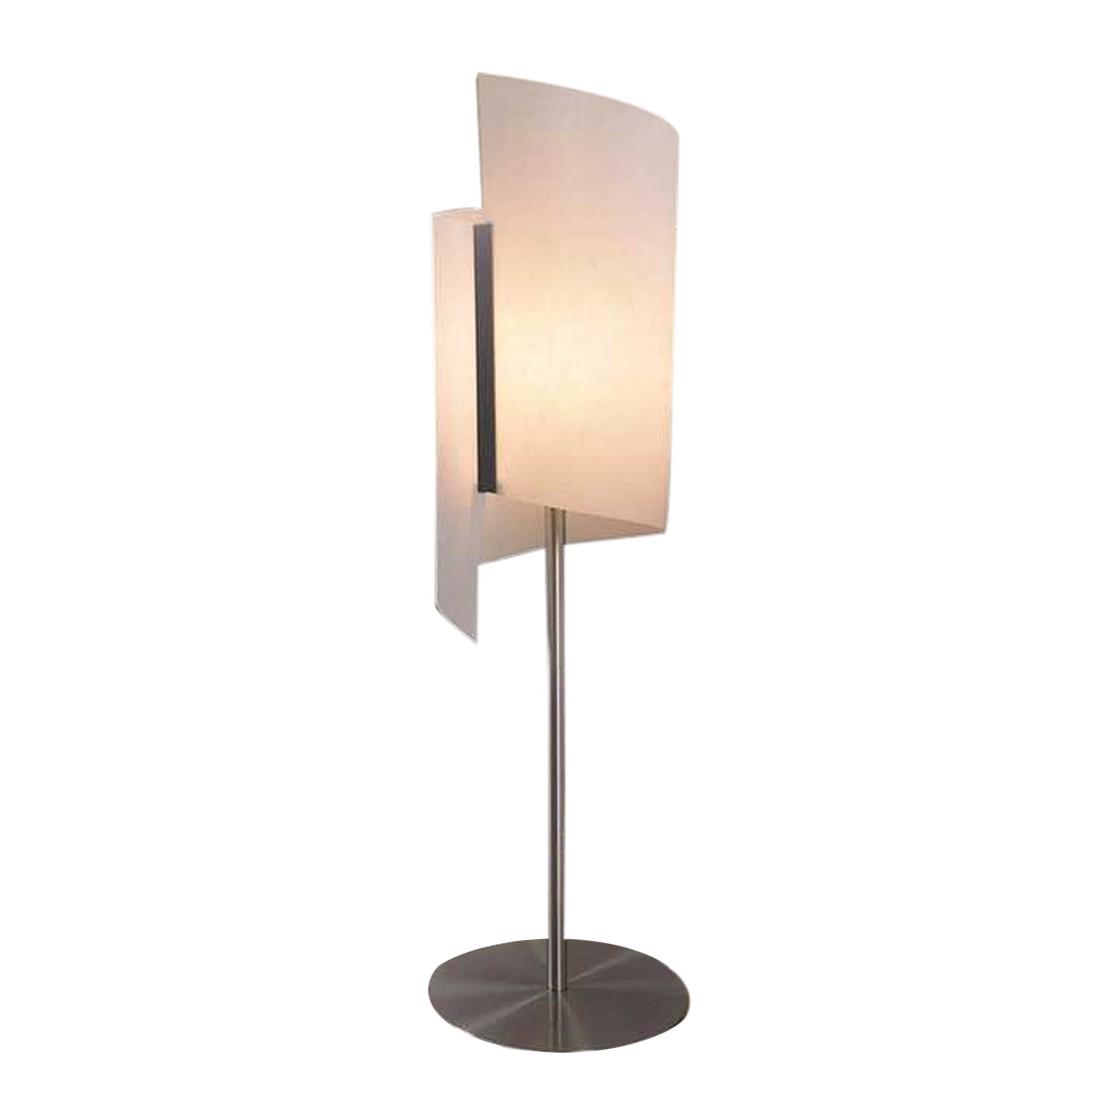 tischleuchte helix h he 53cm aluminium geschliffen. Black Bedroom Furniture Sets. Home Design Ideas